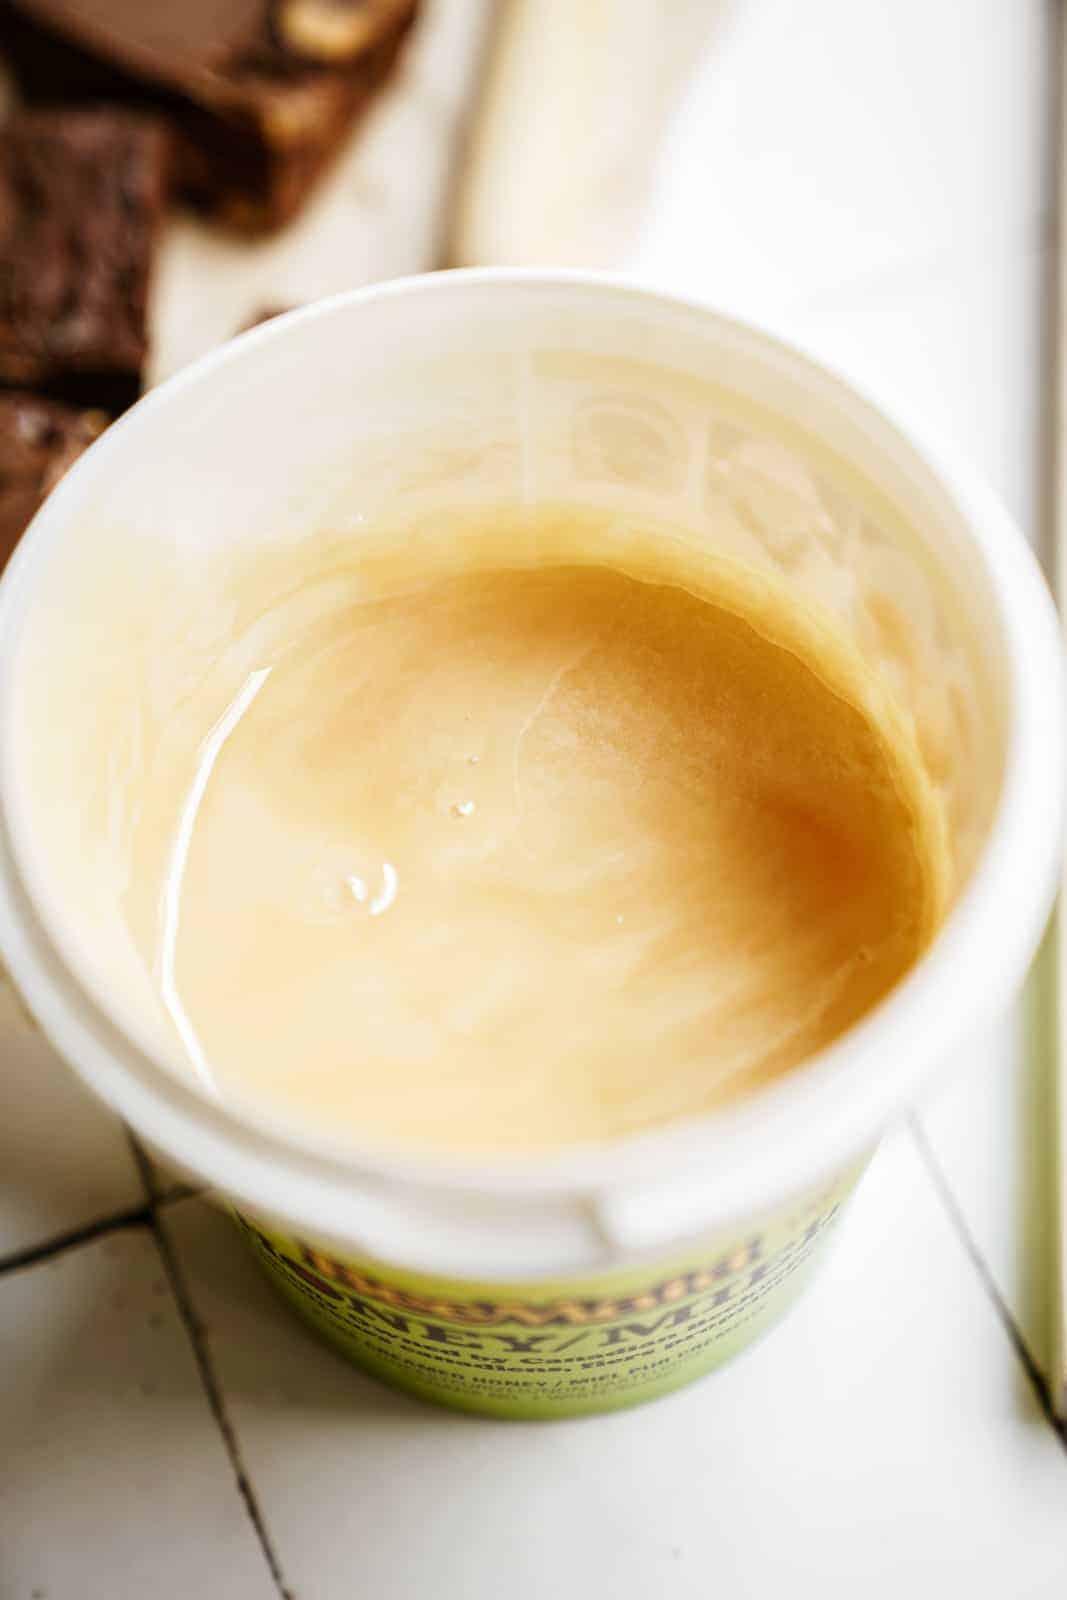 Tub of Beemaid Liquid Honey for Chocolate Peanut Butter Fudge